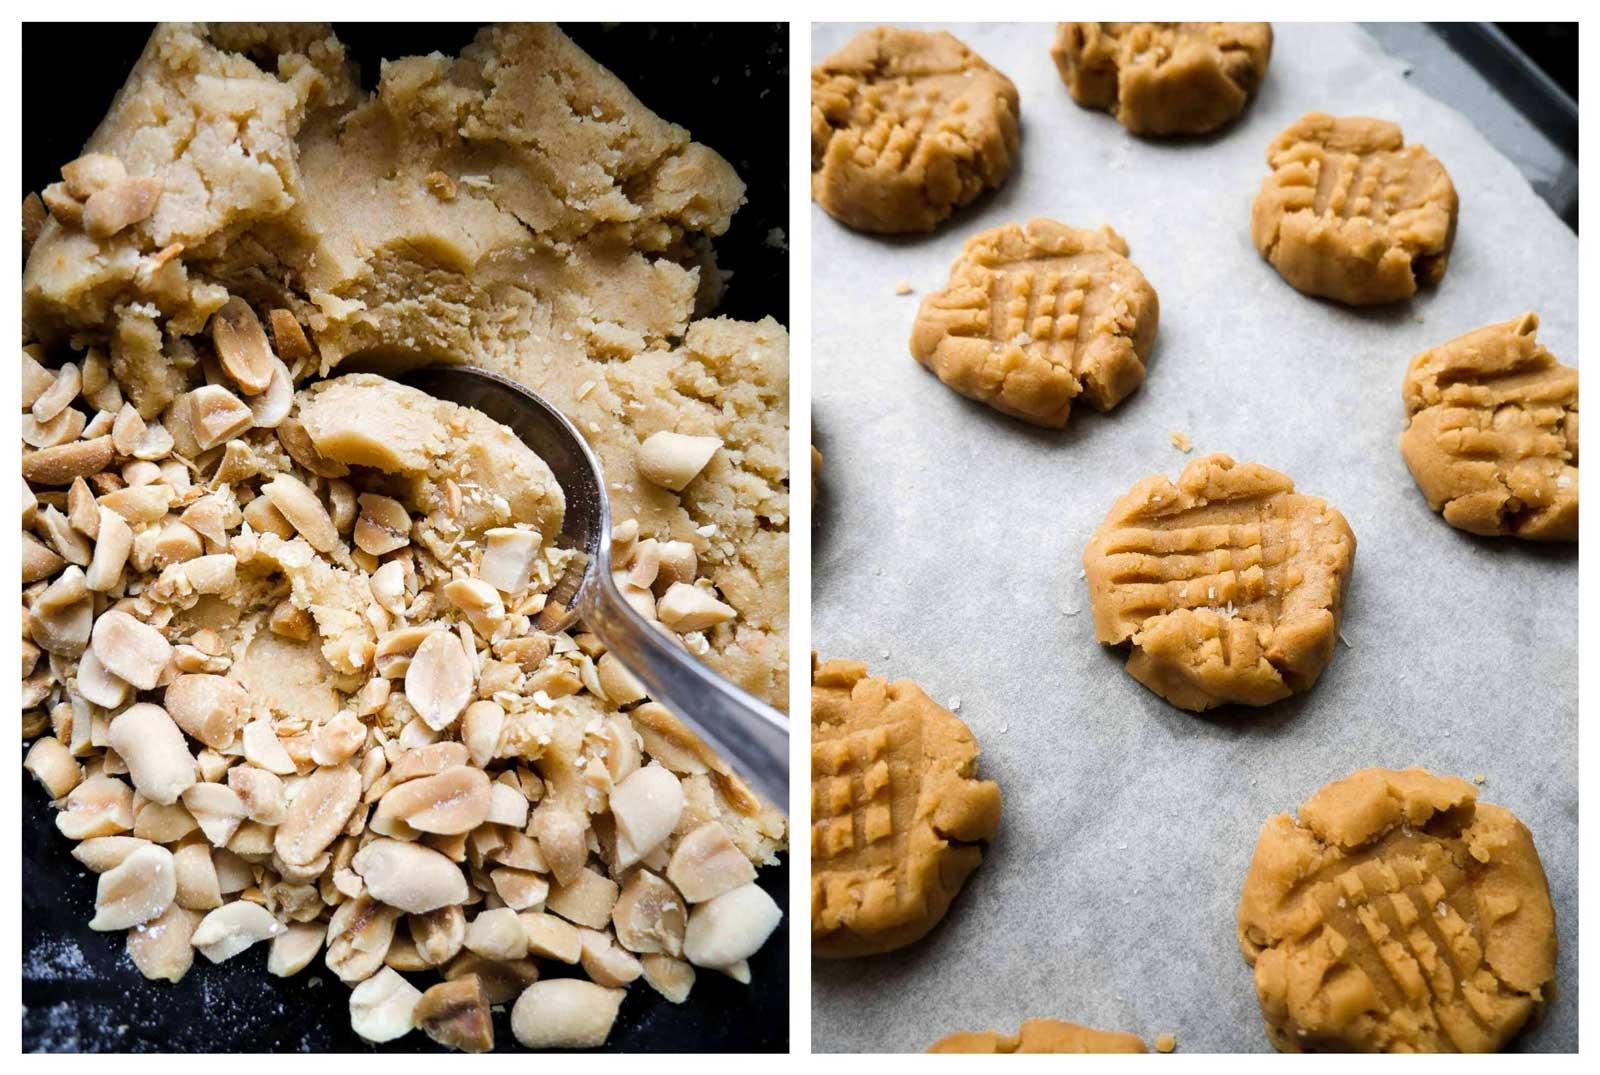 veganske kager og småkager med peanuts